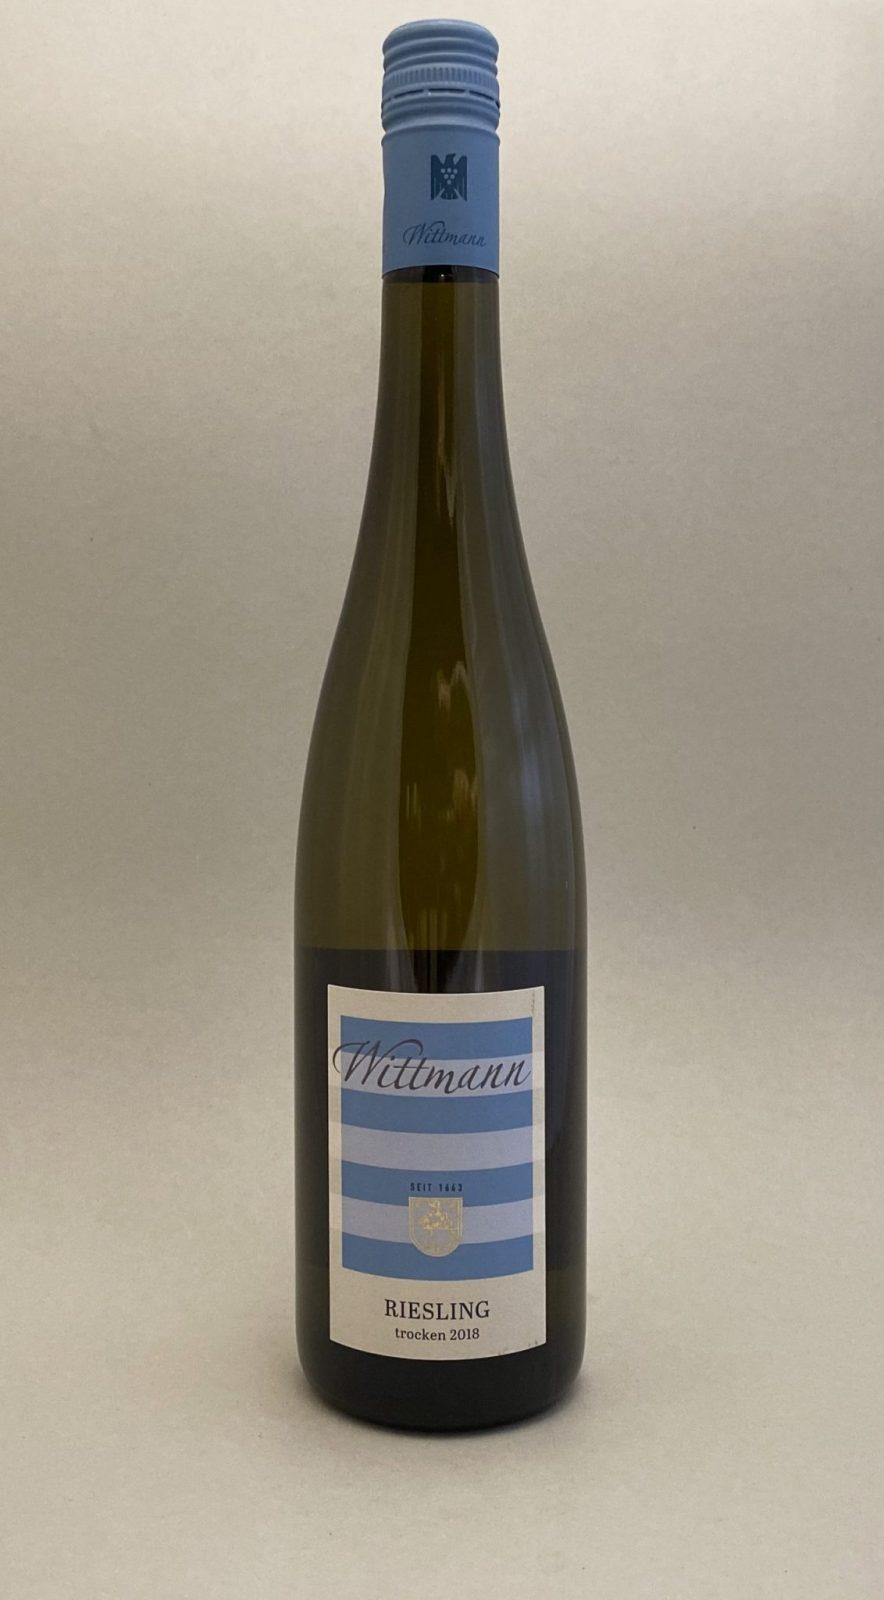 WITTMANN Riesling 2018, vinoteka Bratislava Sunny wines slnecnice mesto, petrzalka, vino biele z Nemecka